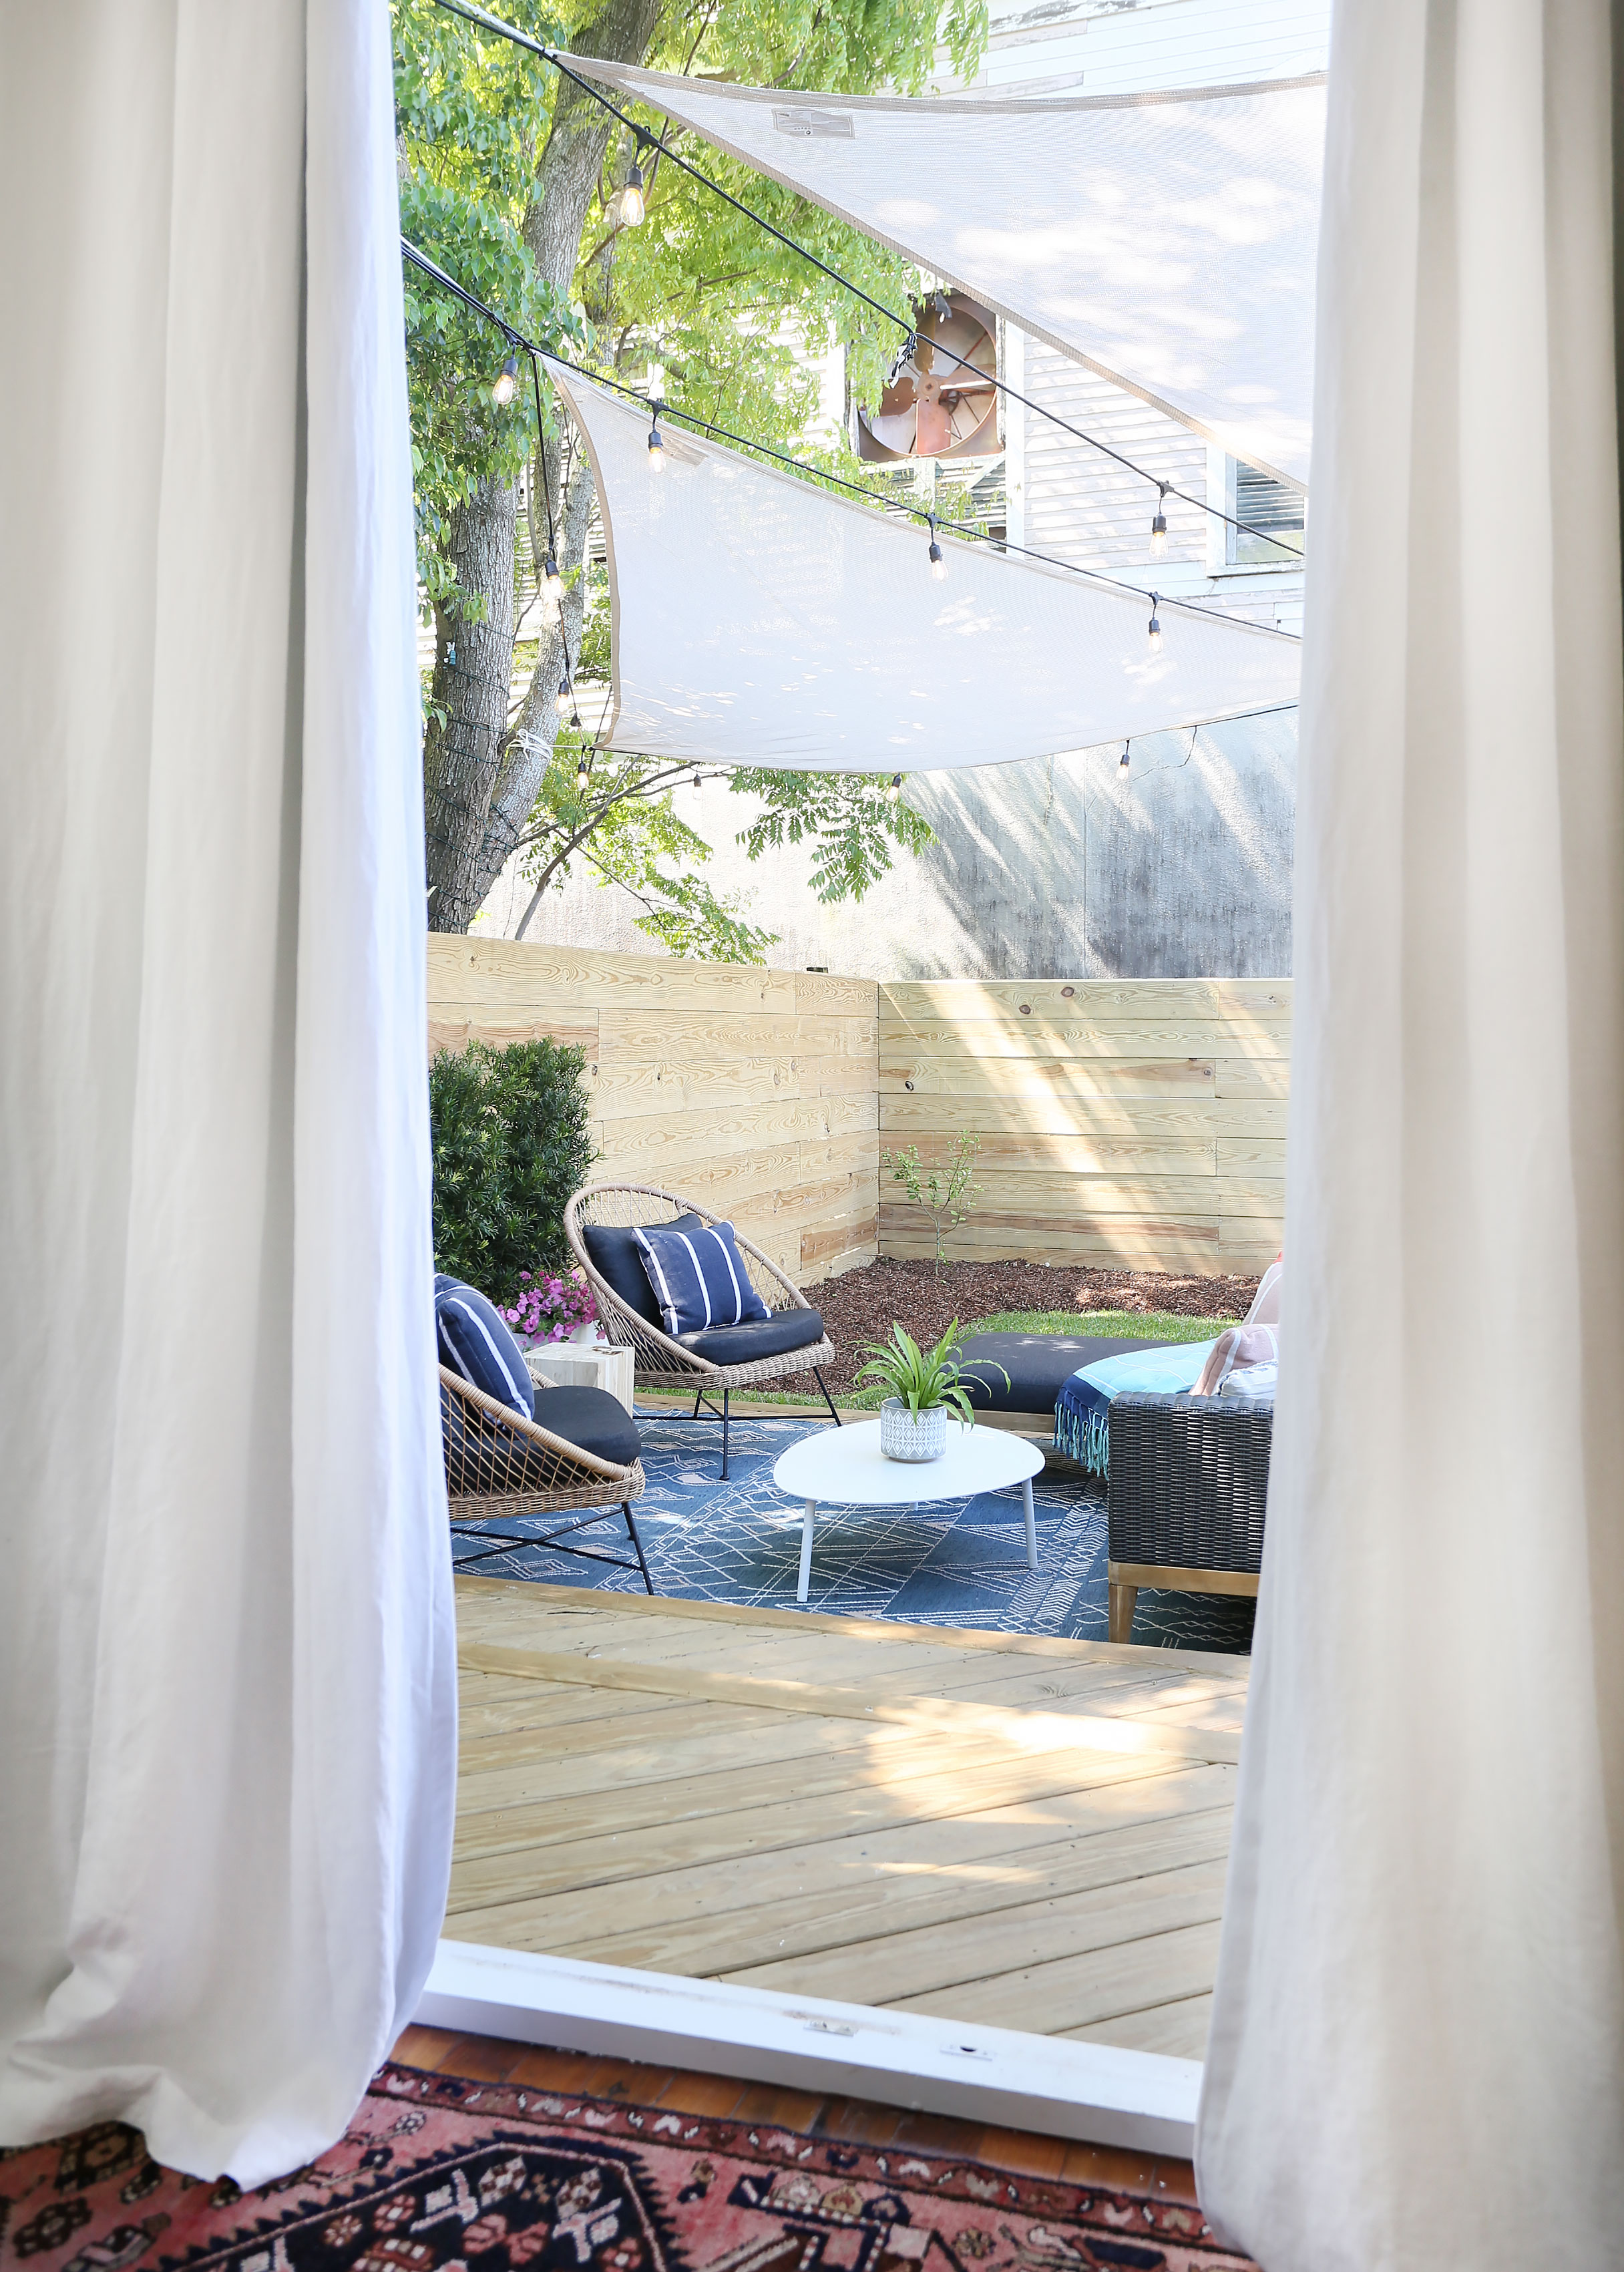 nola-outdoor-3.jpg